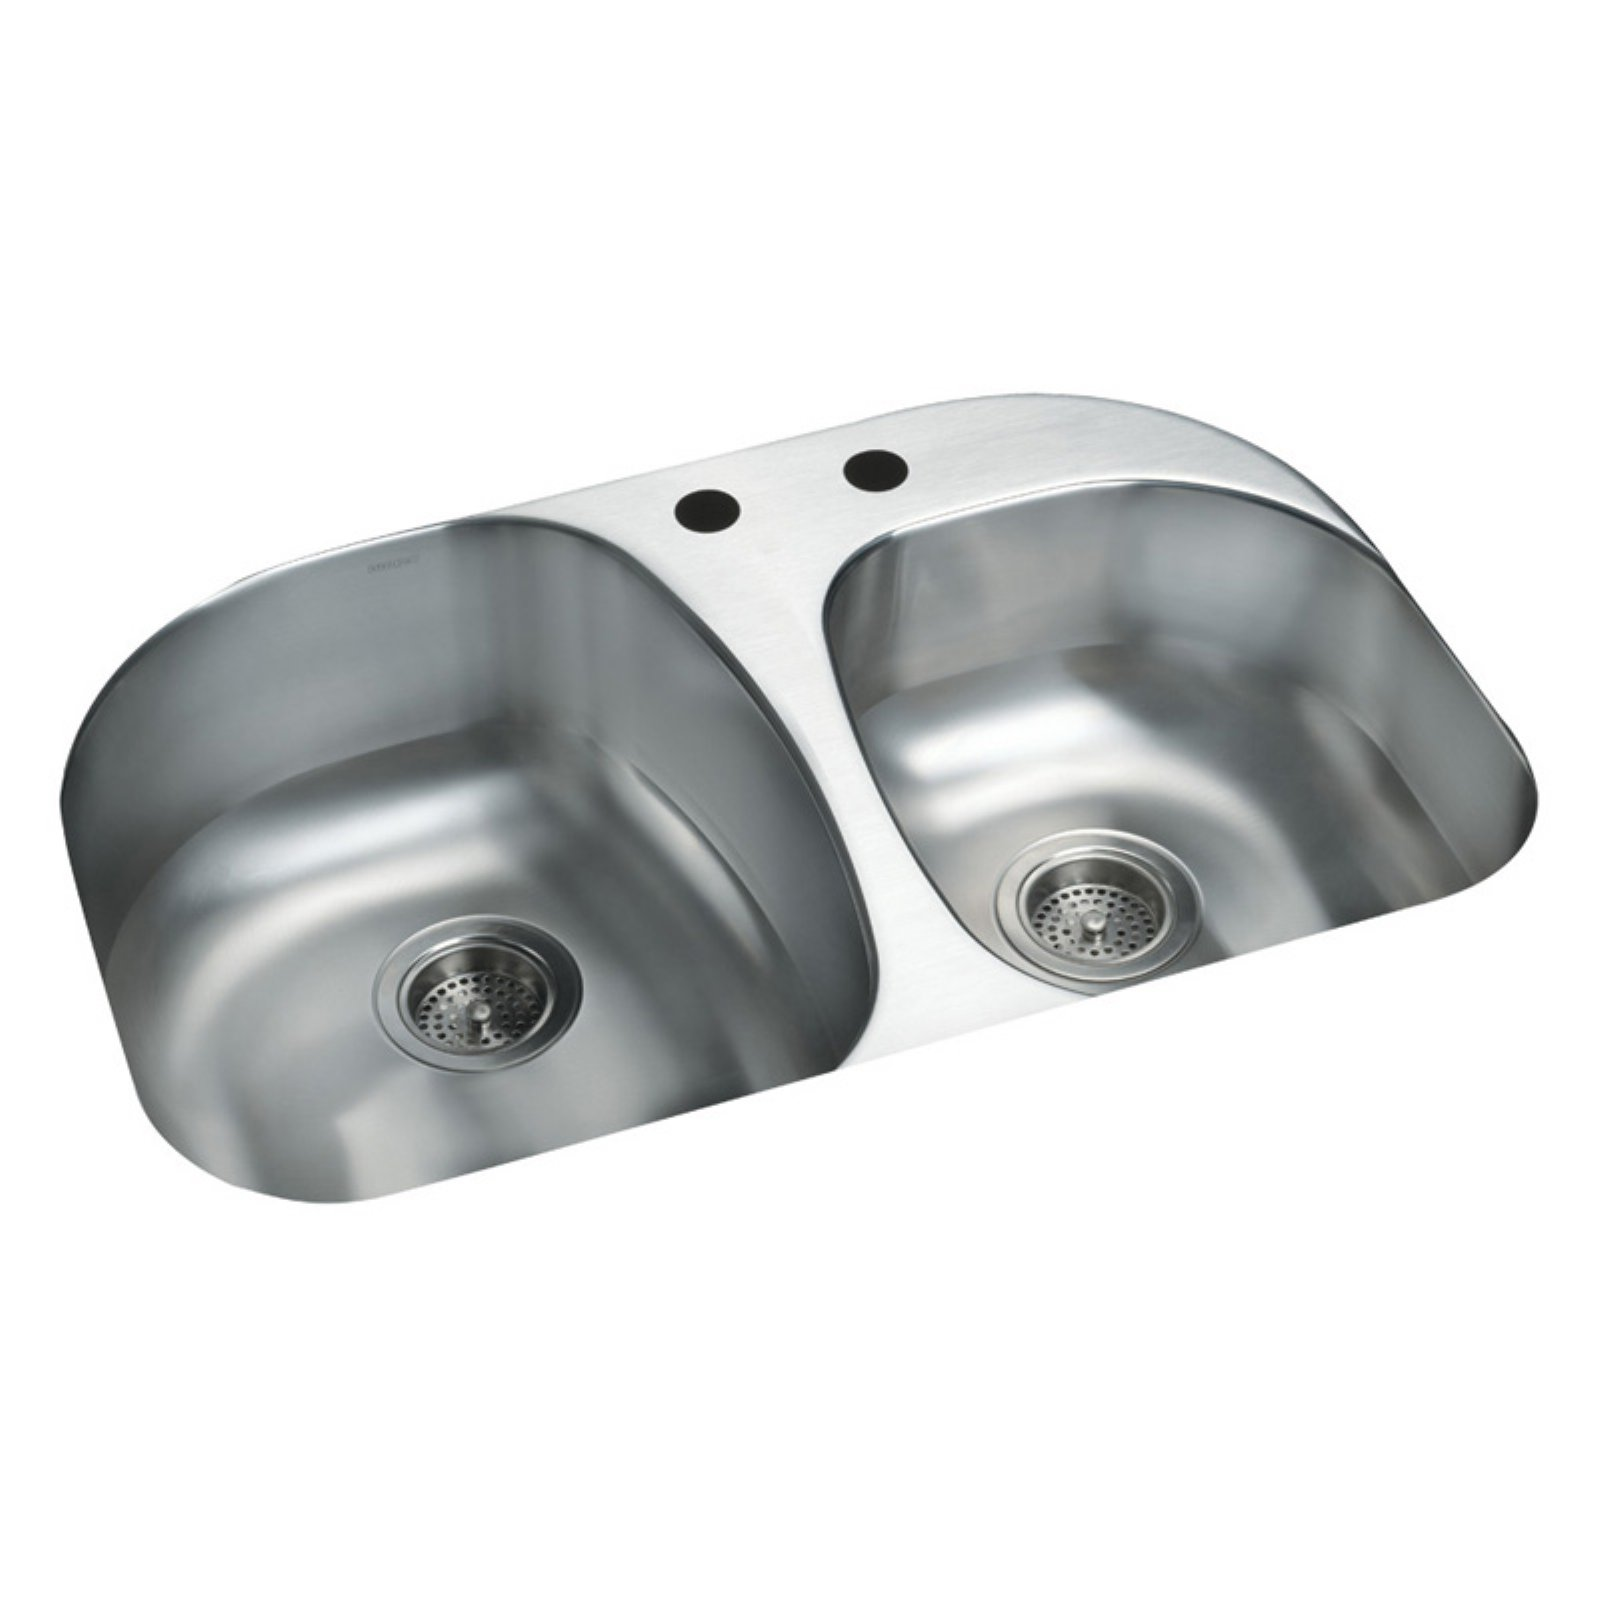 Sterling by Kohler Cin.® 11723-2 Double Basin Undermount Kitchen Sink